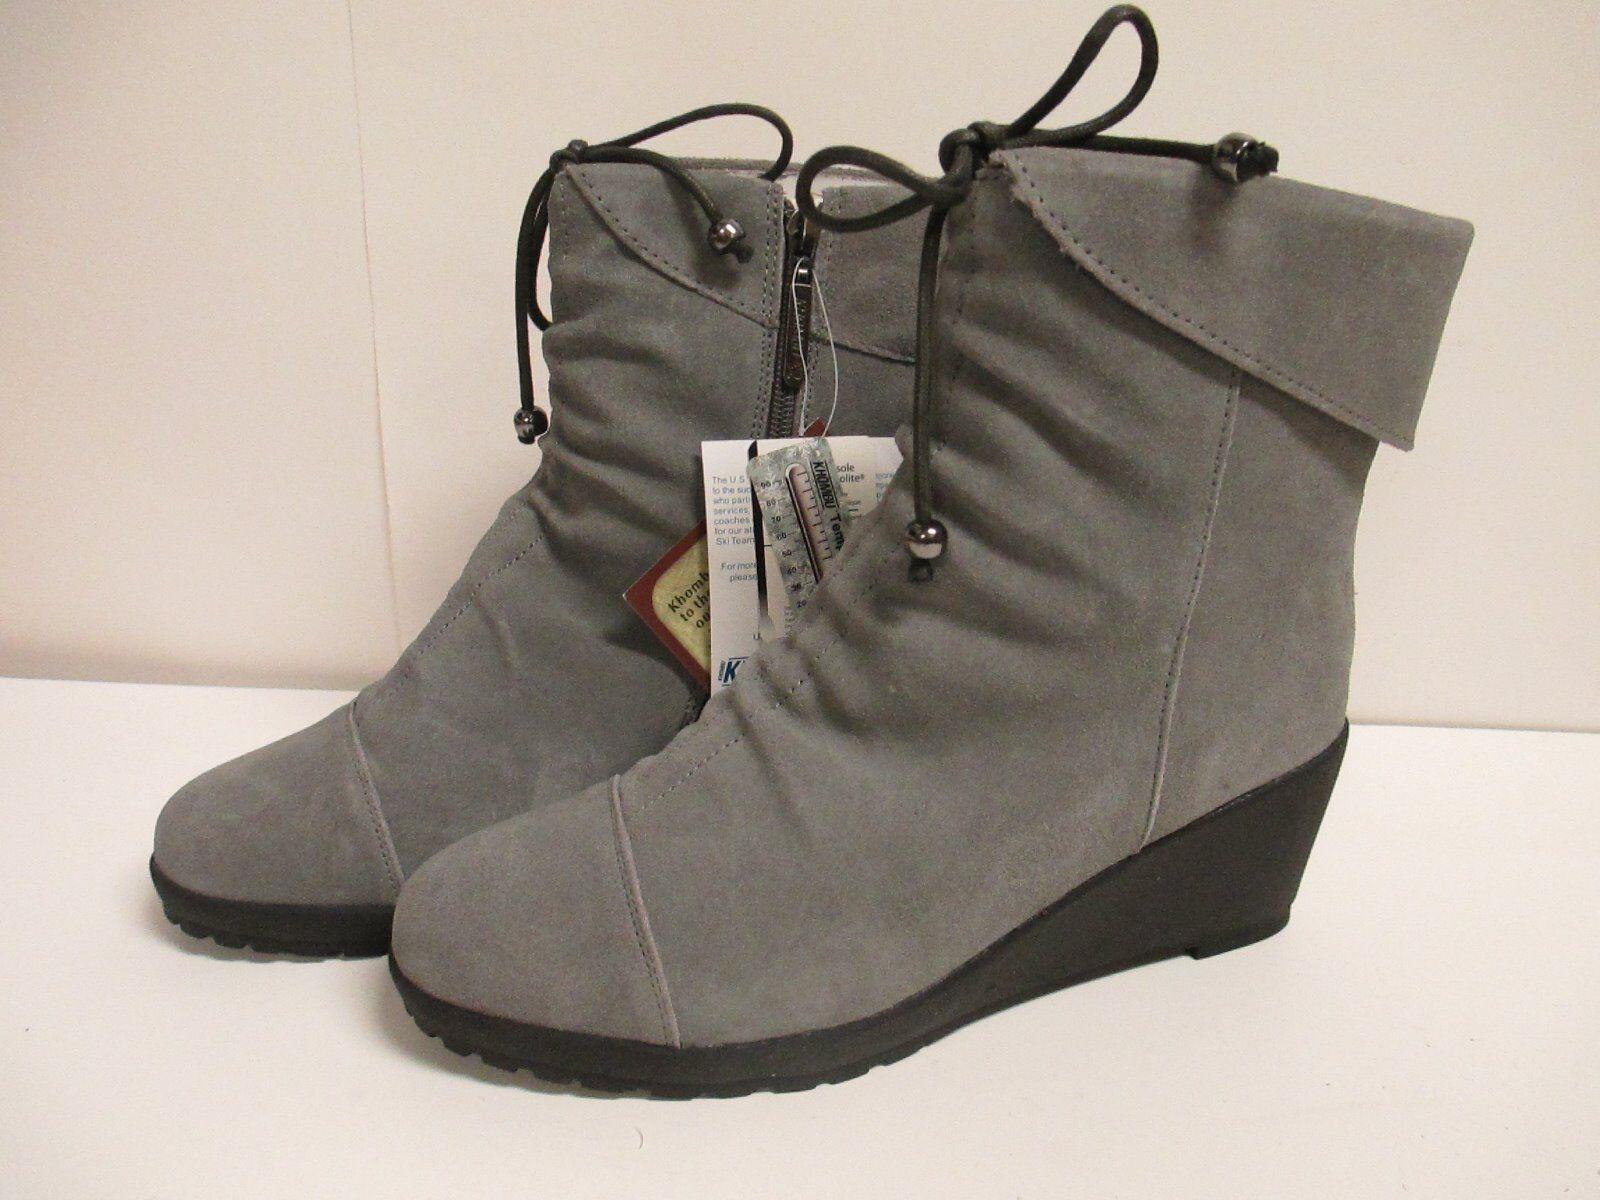 Khombu Sundown Wedge Heel Boot 9 M Grau New w/ Box